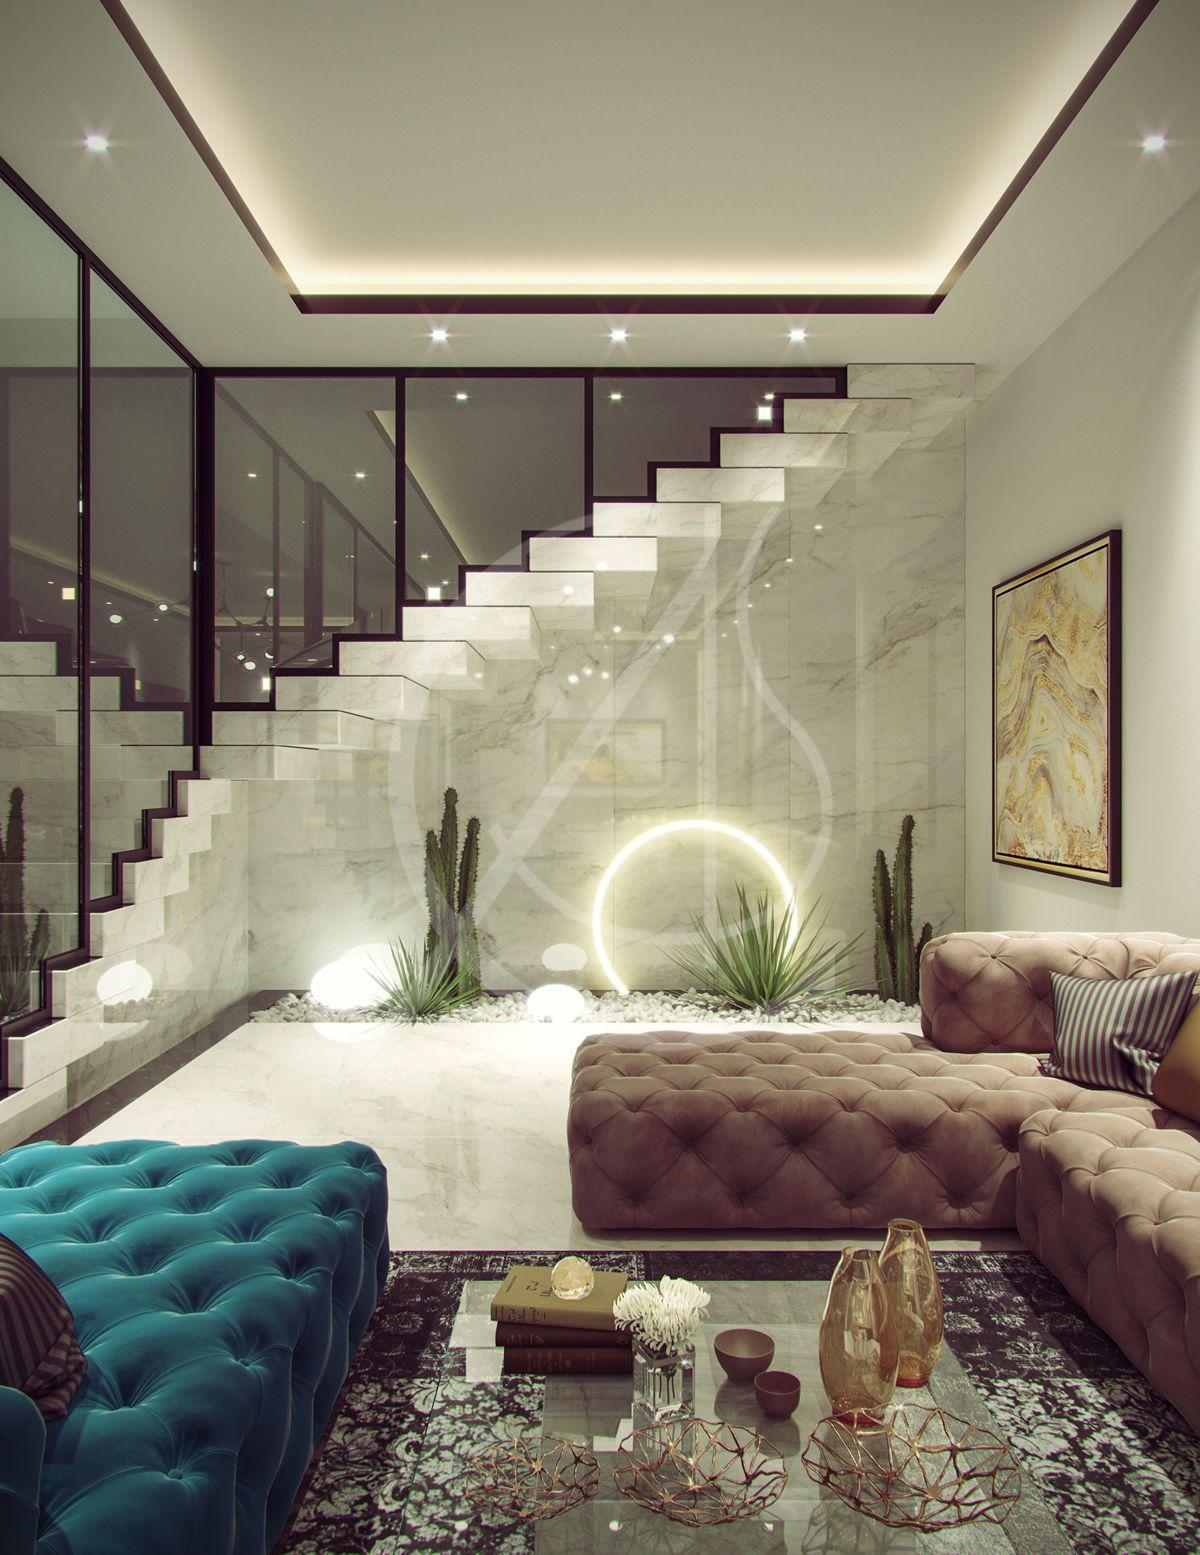 Family Villa Contemporary Arabic Interior Design   Riyadh, Saudi ...